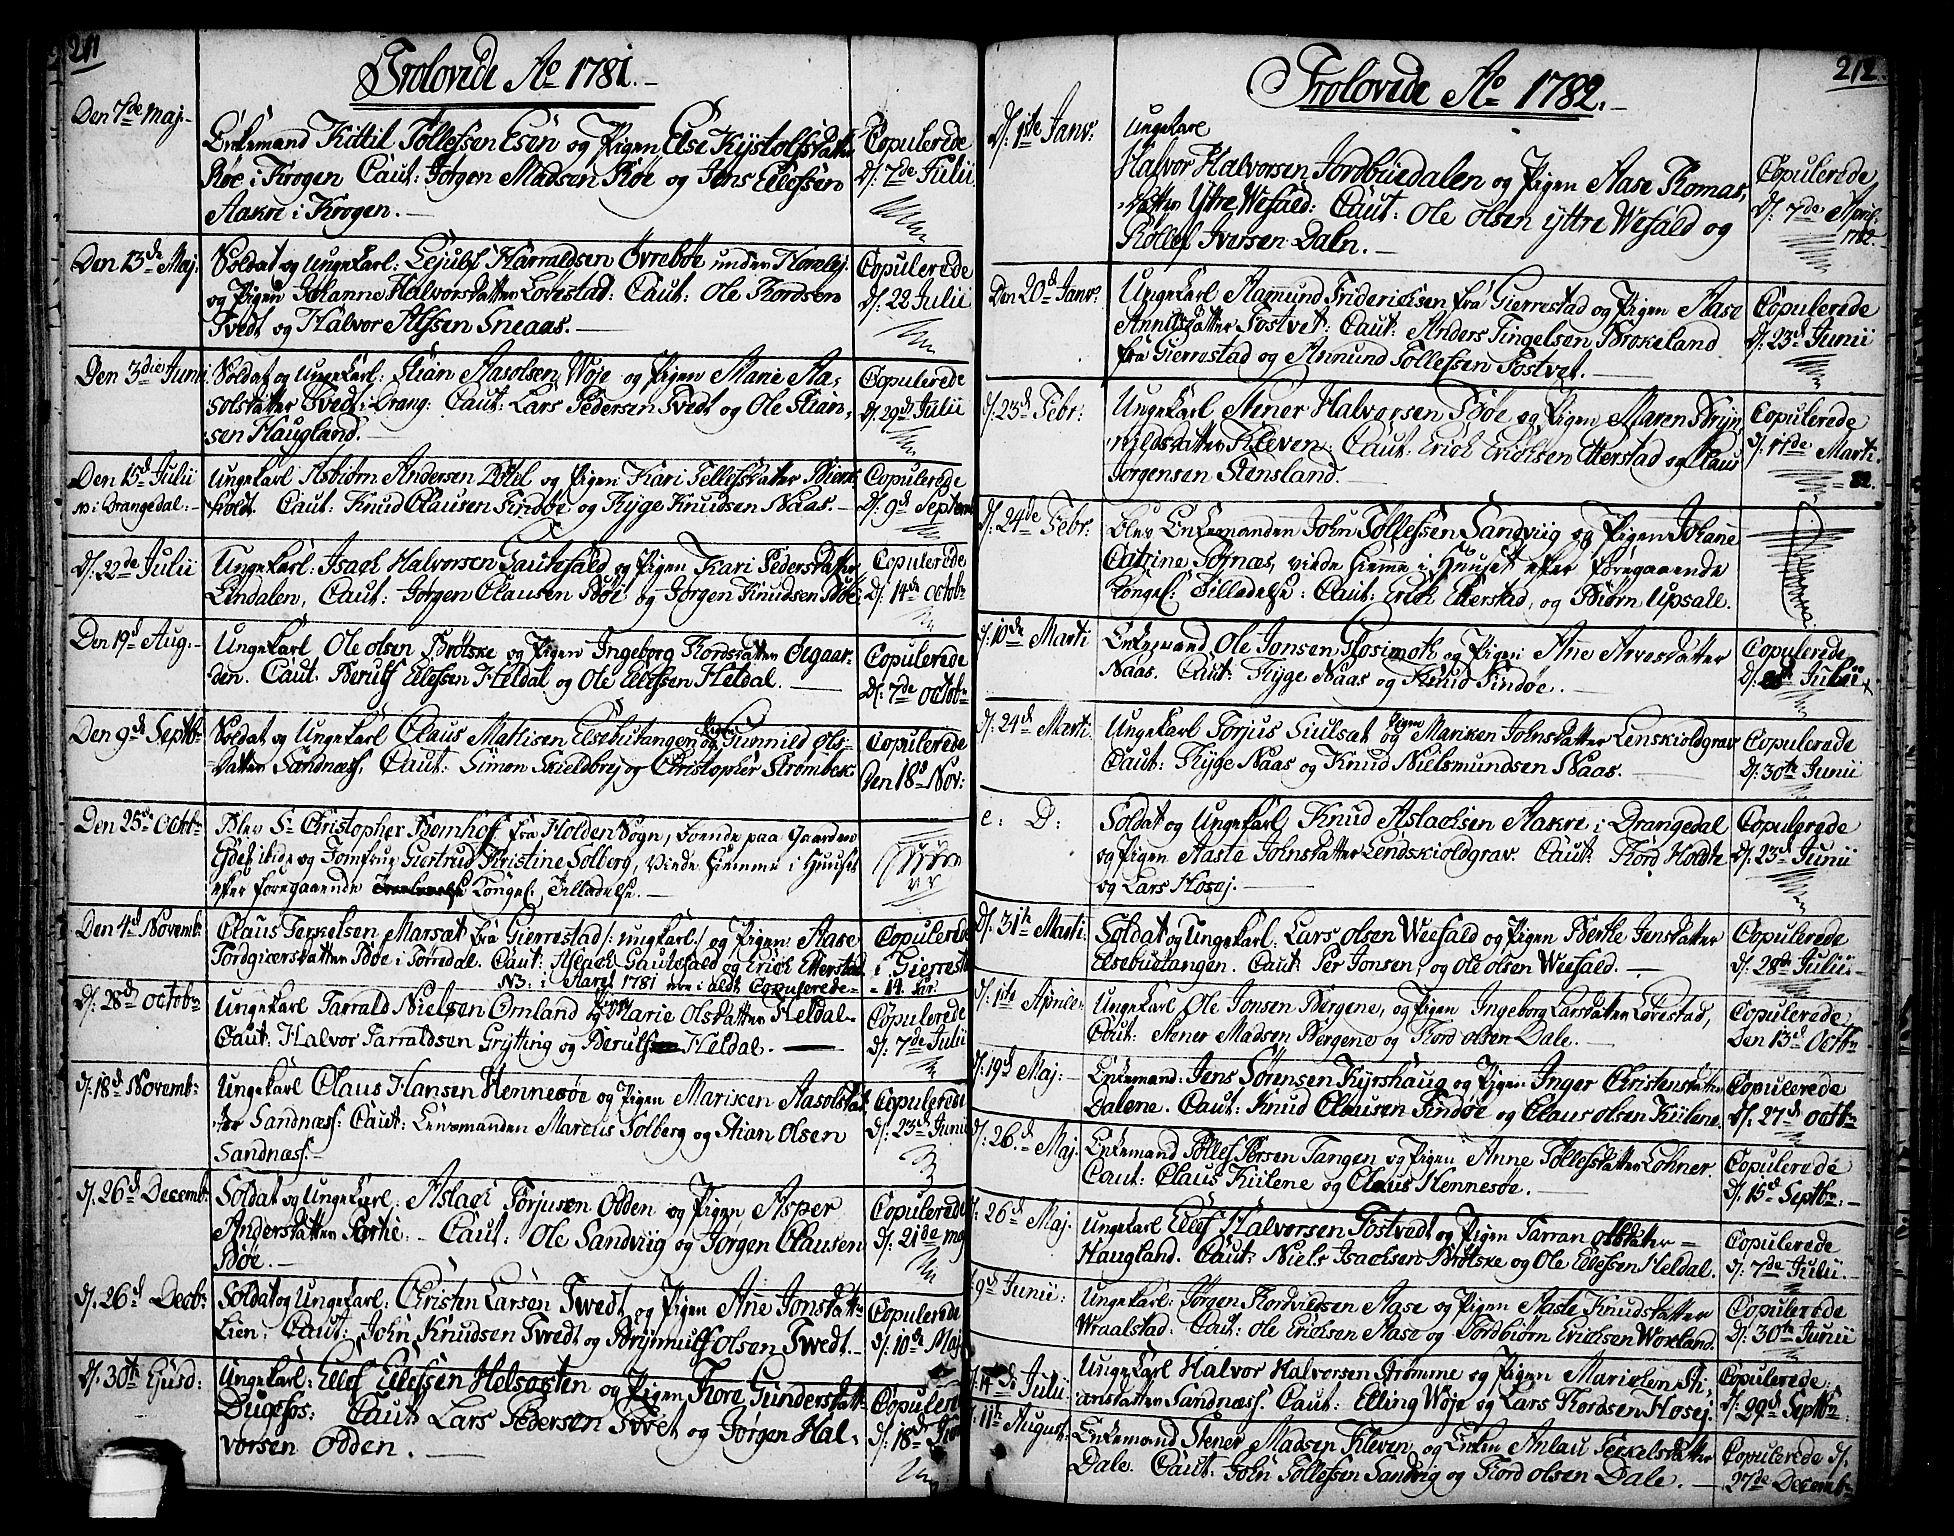 SAKO, Drangedal kirkebøker, F/Fa/L0003: Ministerialbok nr. 3, 1768-1814, s. 211-212